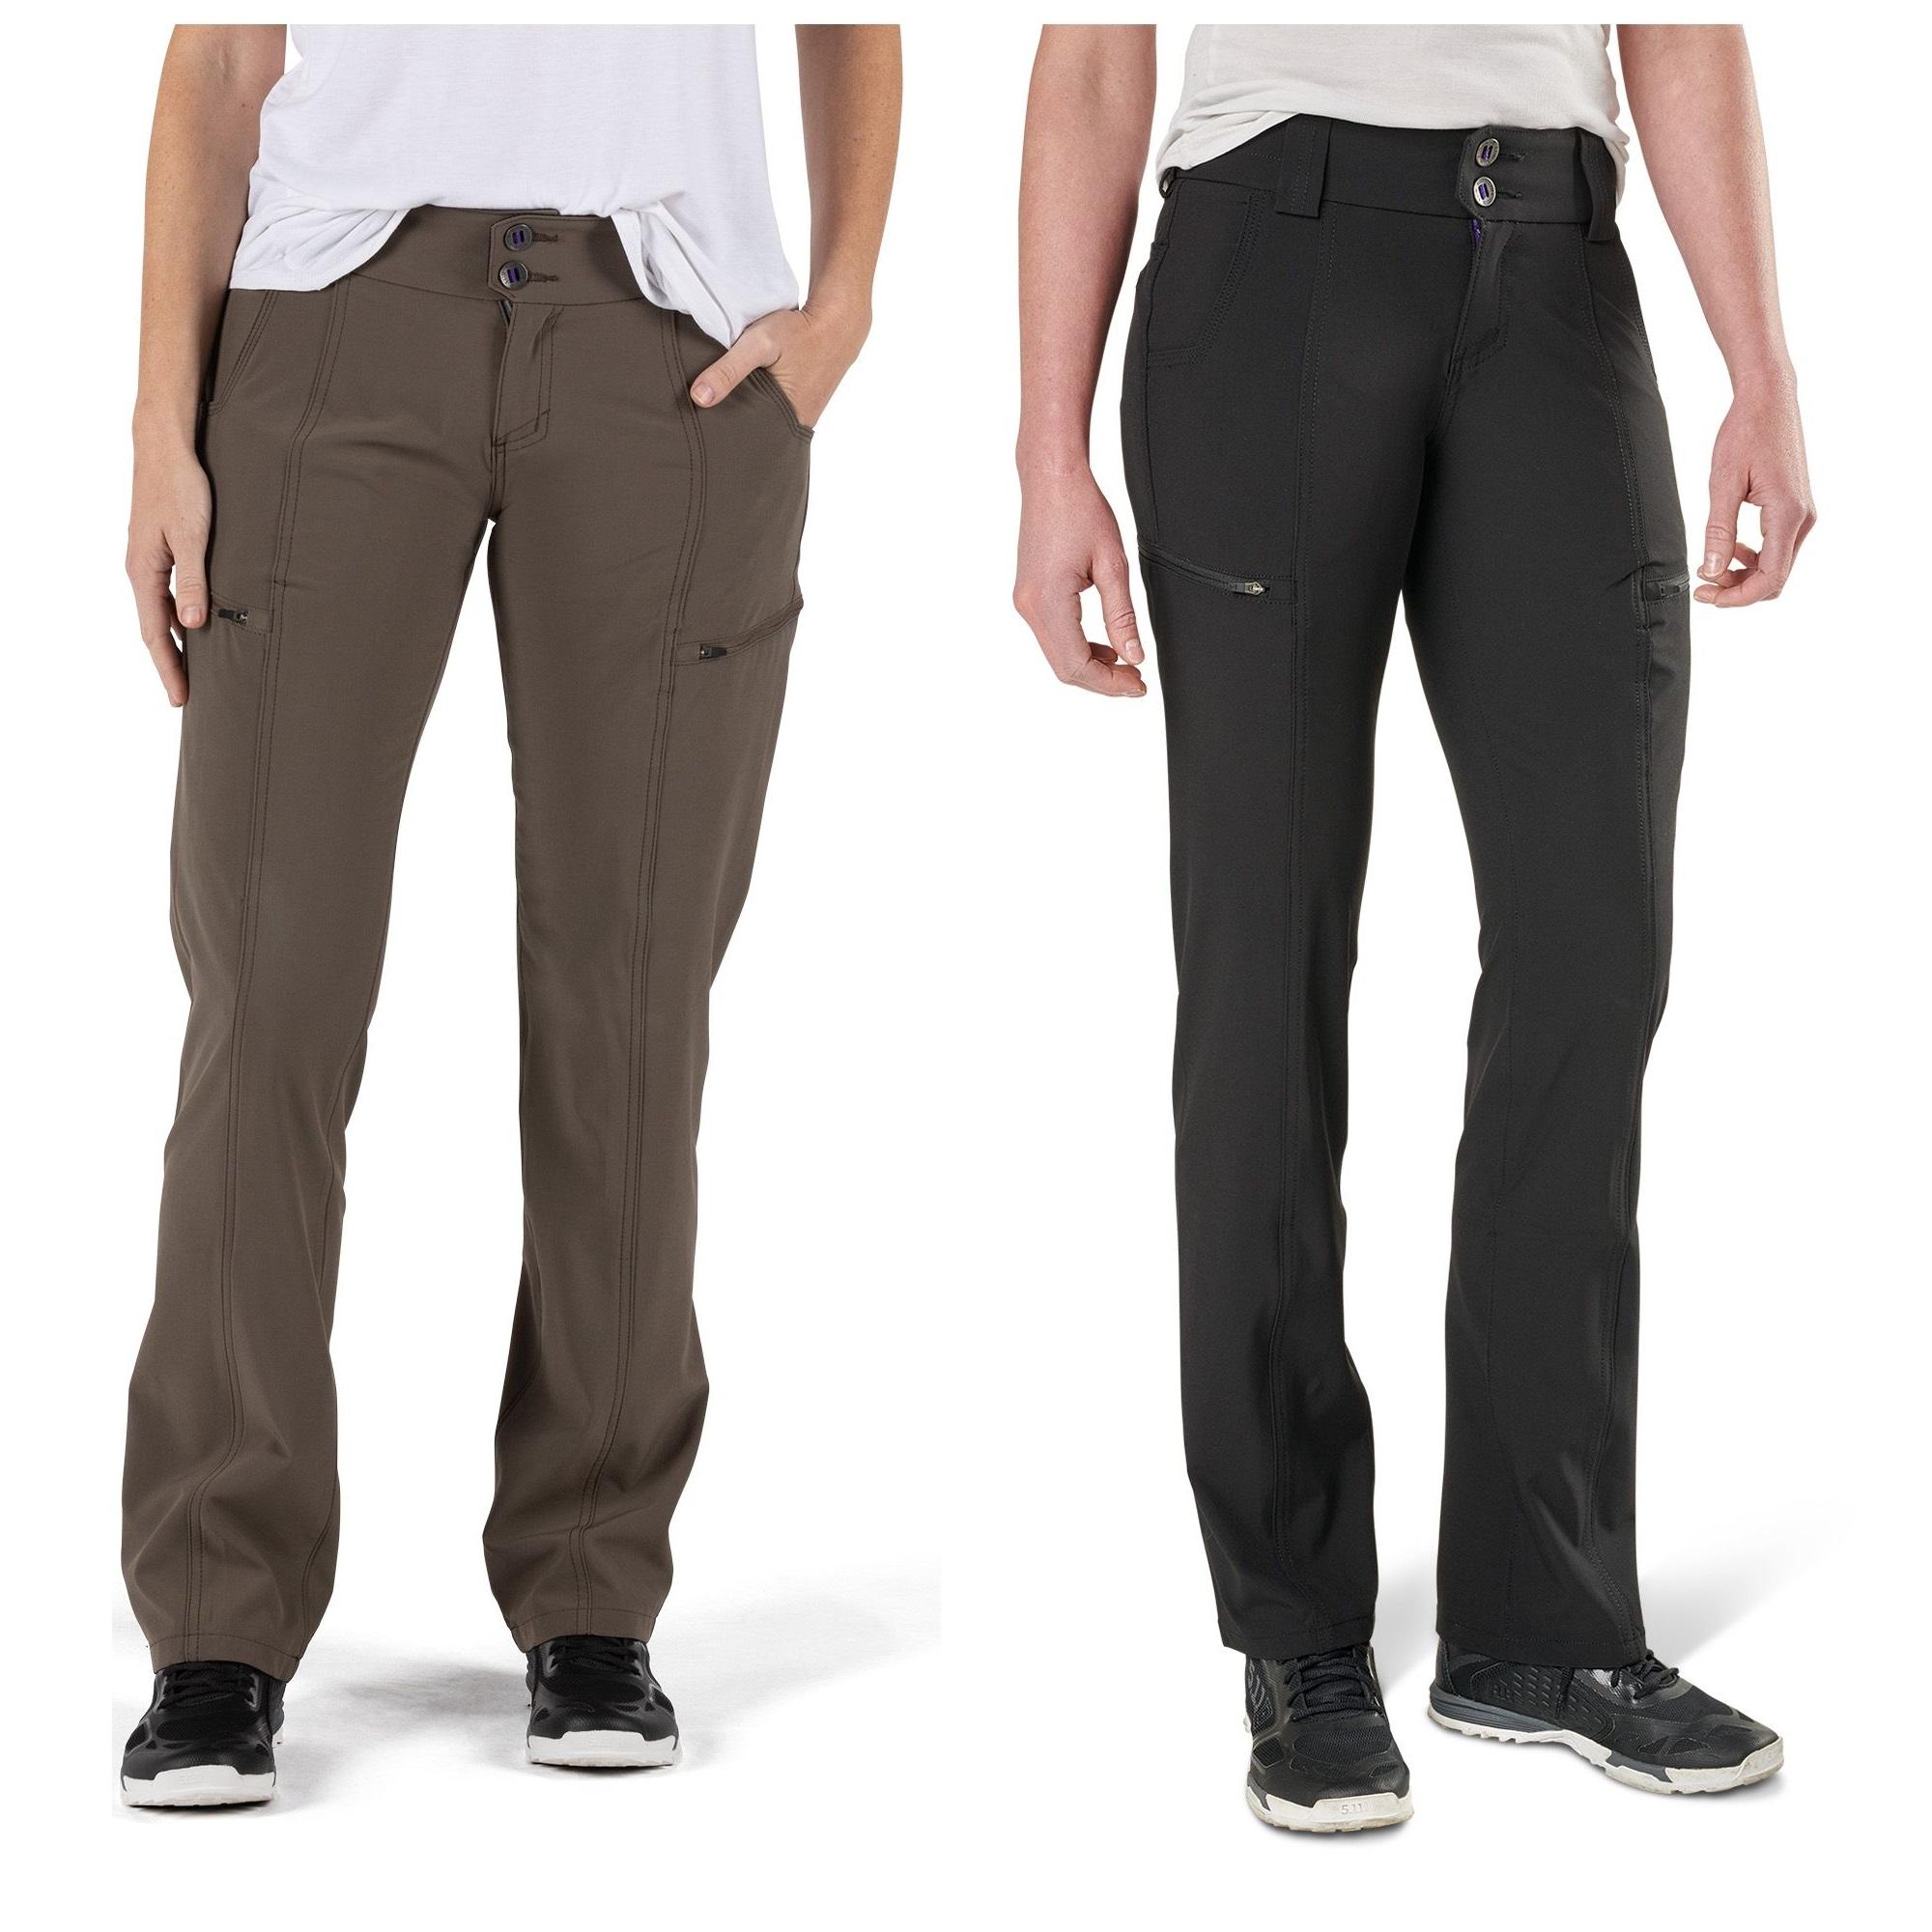 Contoured Waistband Style 64417 5.11 Tactical Women/'s Mesa Pants Cargo Pockets